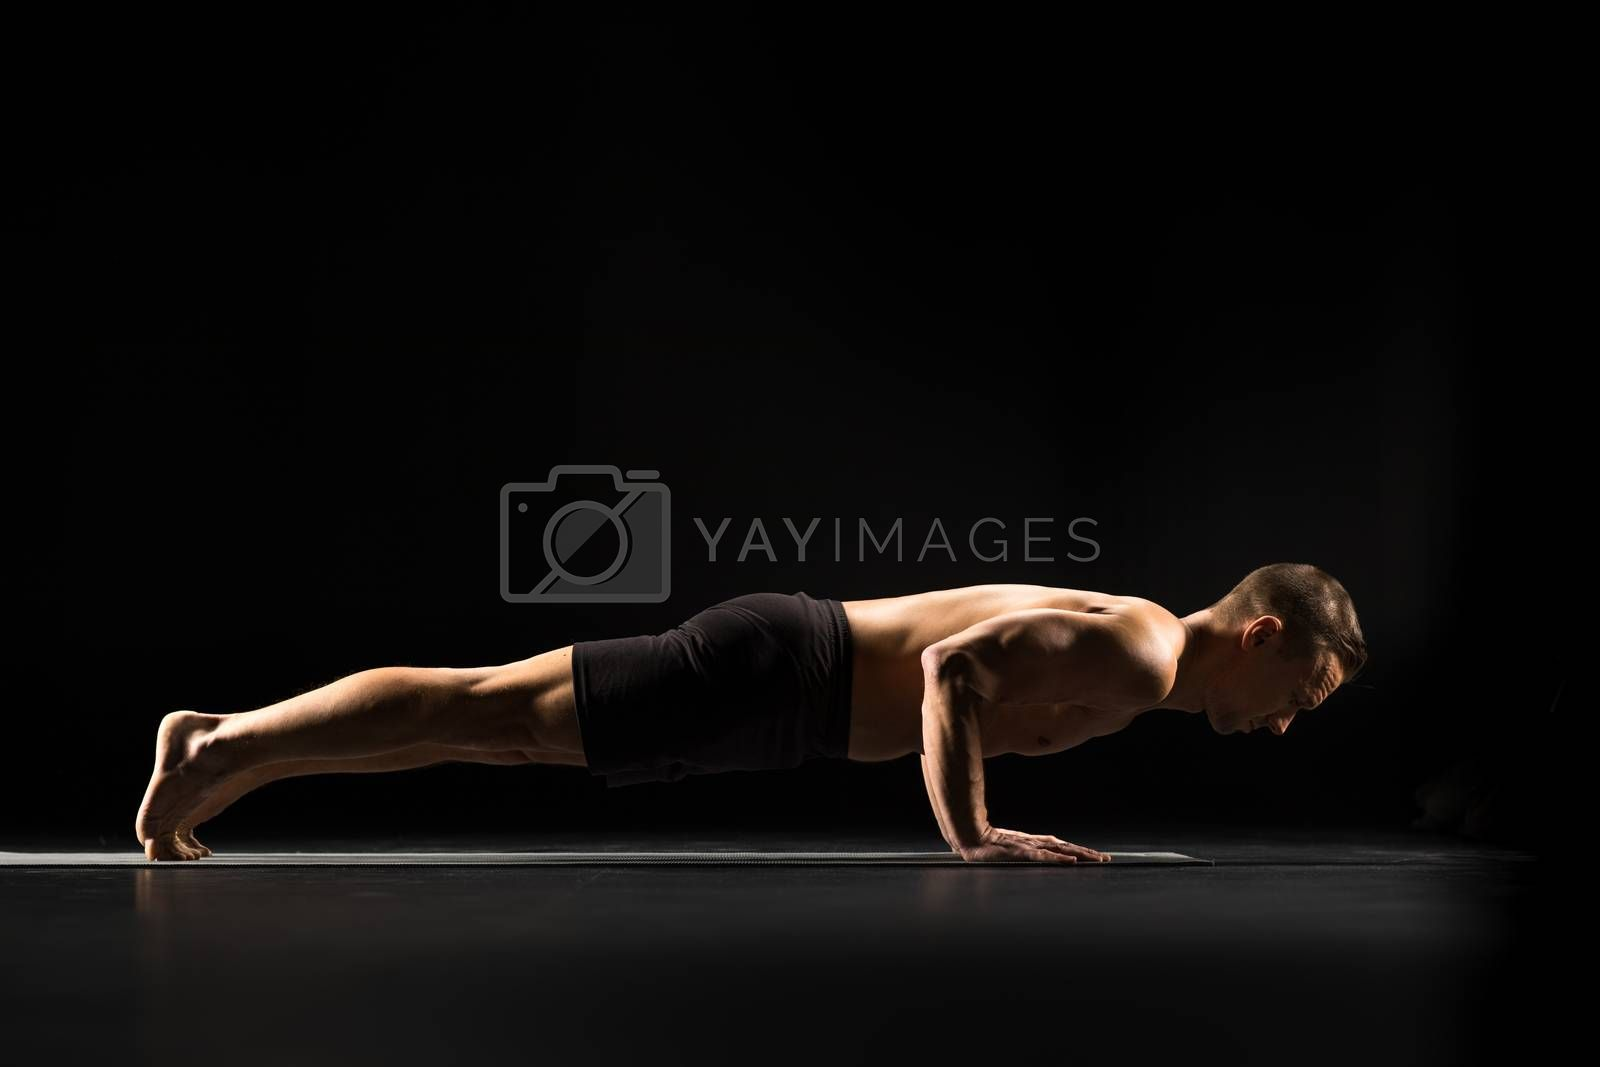 Man performing Chaturanga Dandasana or Four Limbed Staff Pose